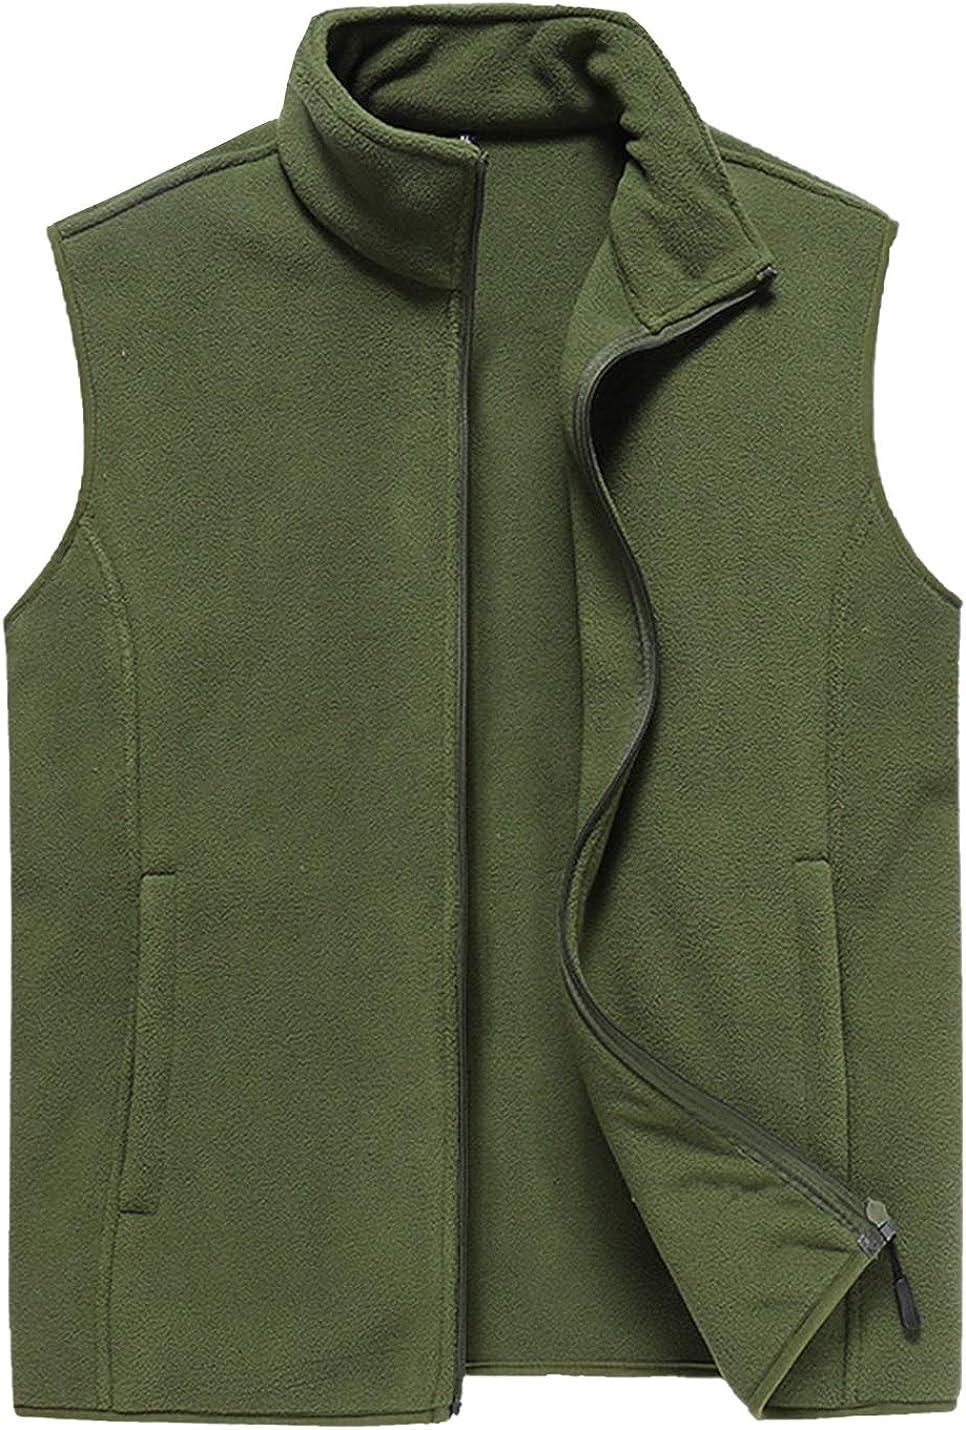 PEHMEA Men's Casual Polar Fleece Vest Winter Warm Stand Collar Full-Zip Lightweight Outwear with Pockets